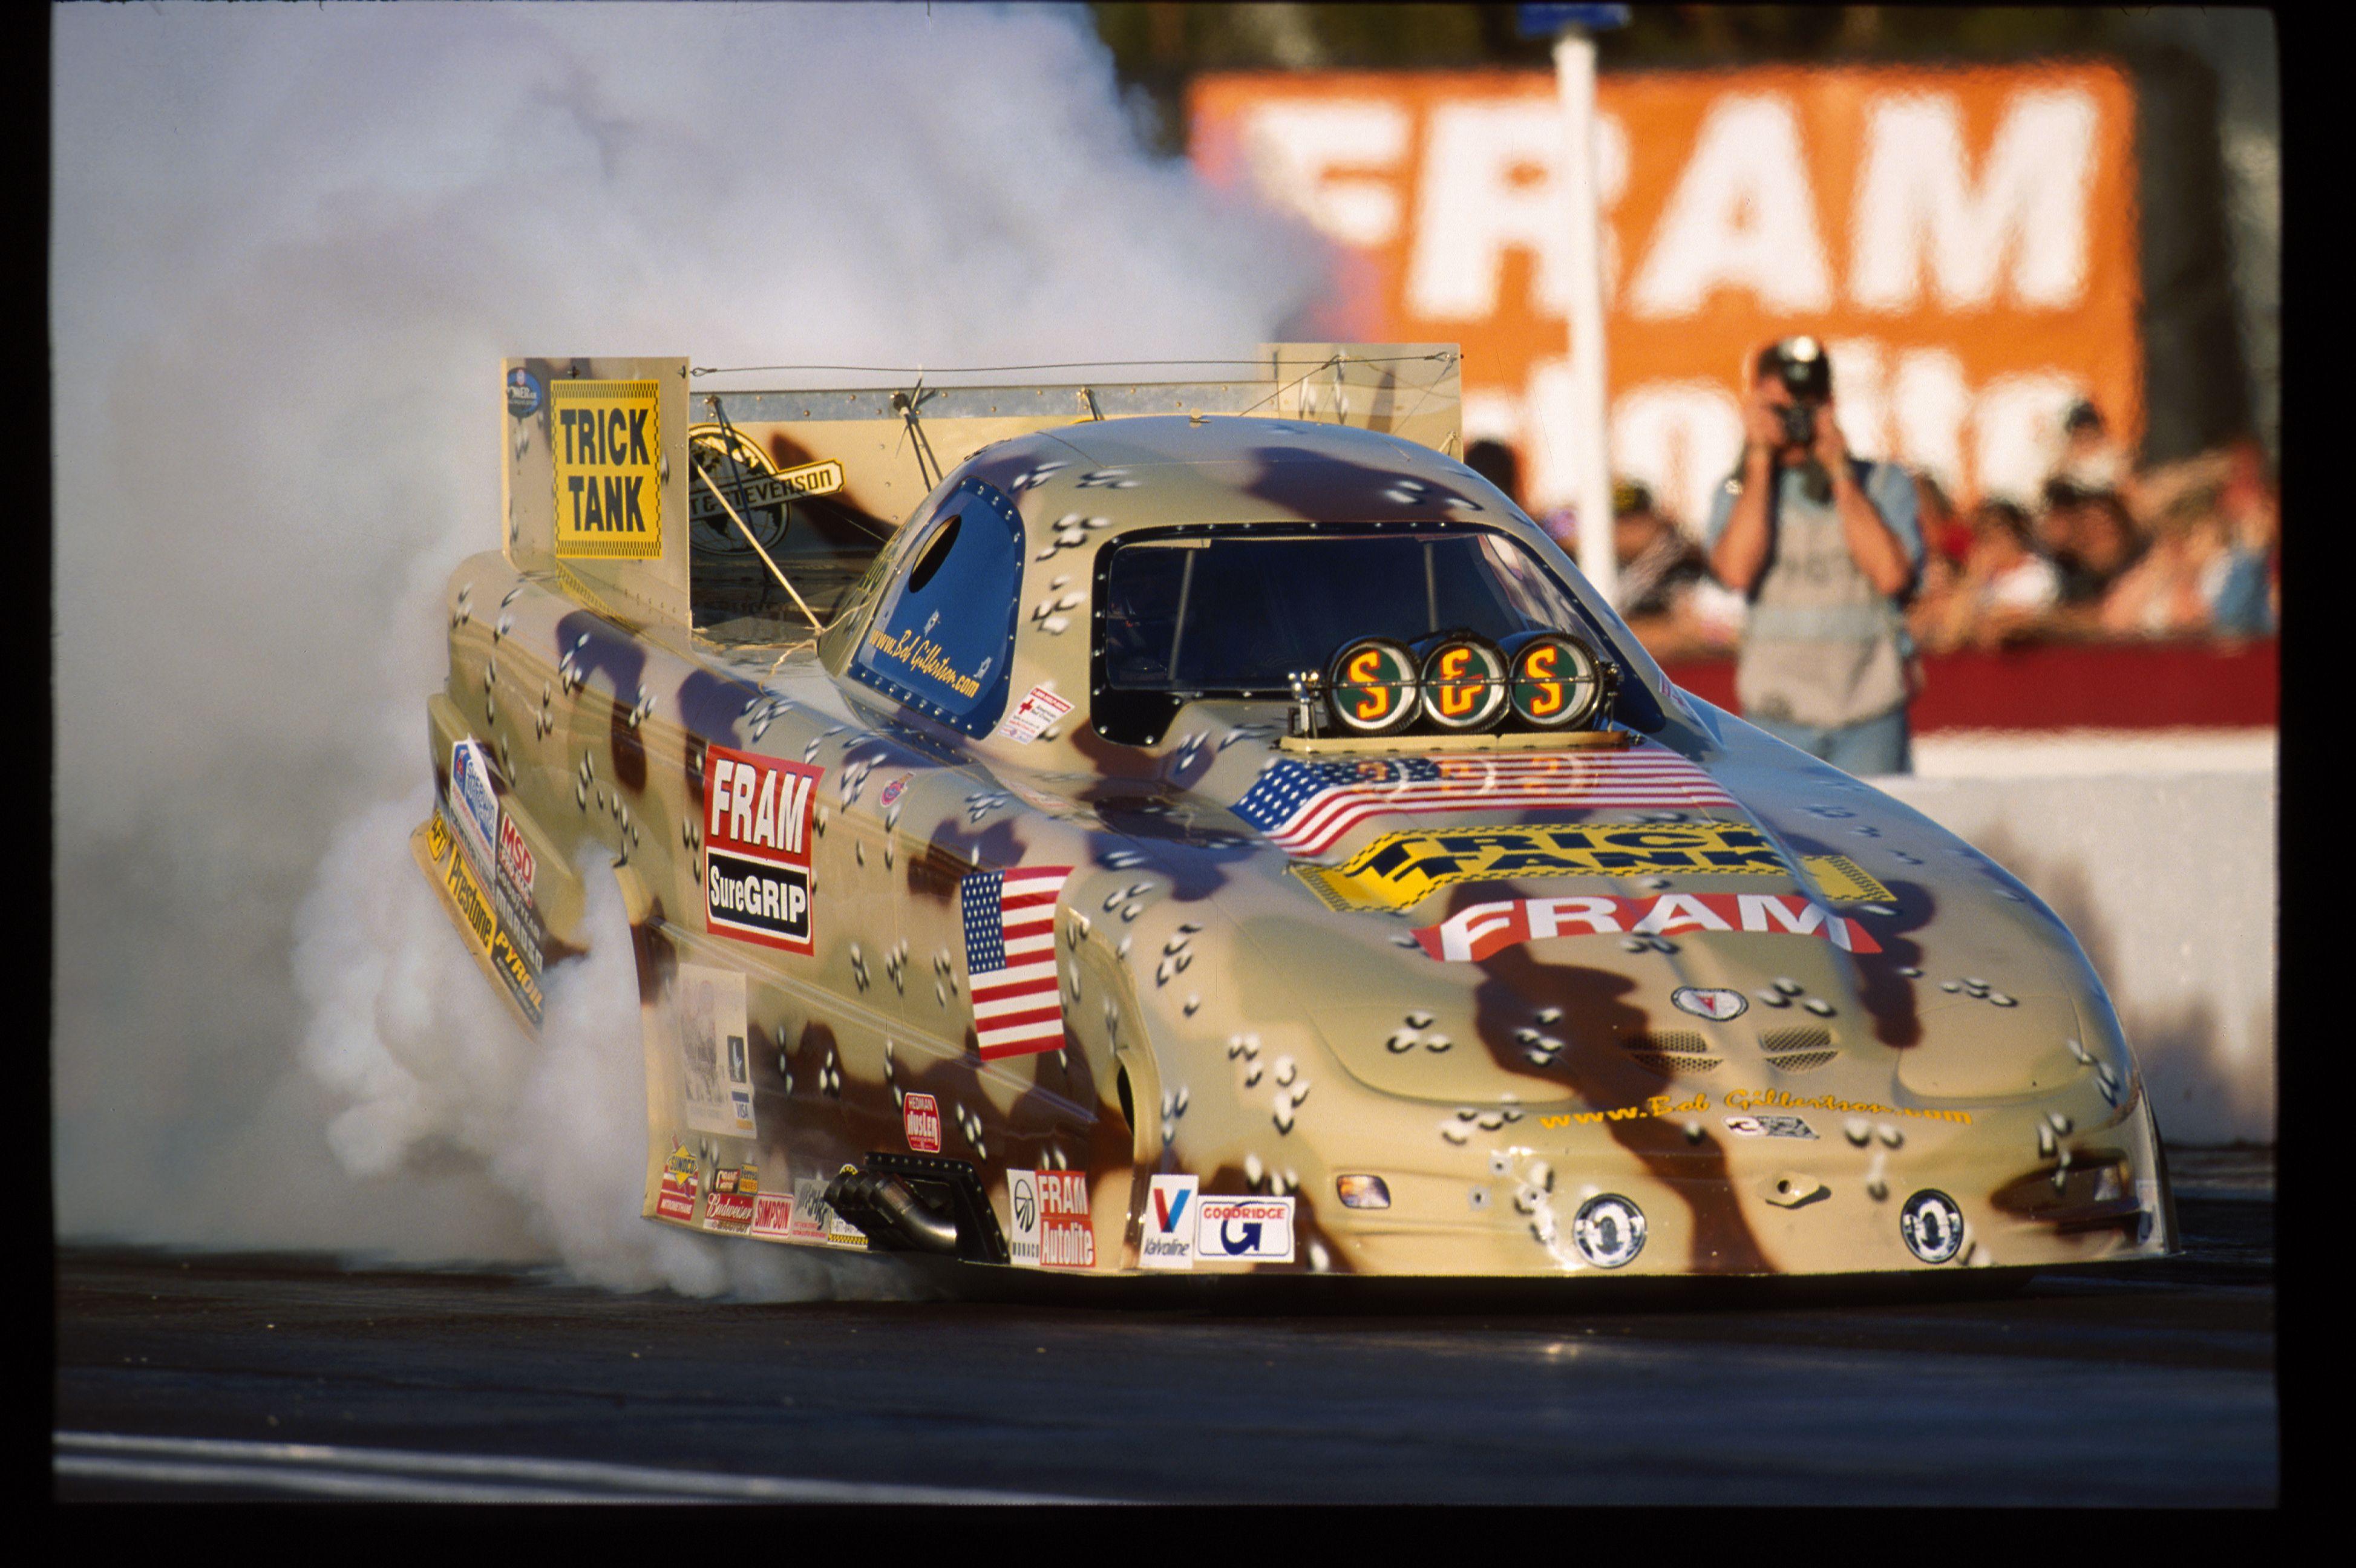 2002 Nhra Funny Car Pinterest Cars And Oil Filter Fram Top Fuel Racing